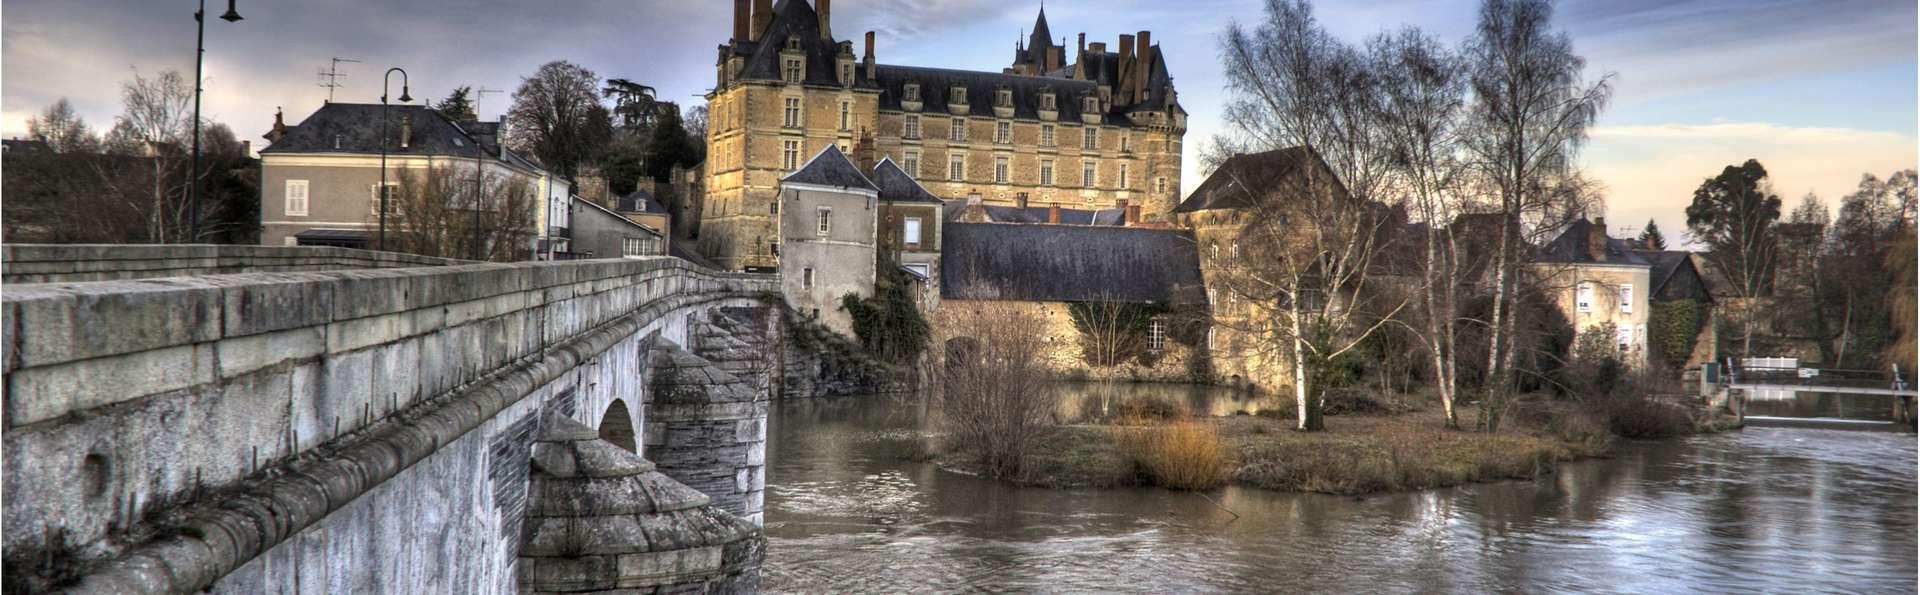 Château de Durtal - Chateau_de_Durtal_Loir_HDR_2.jpg